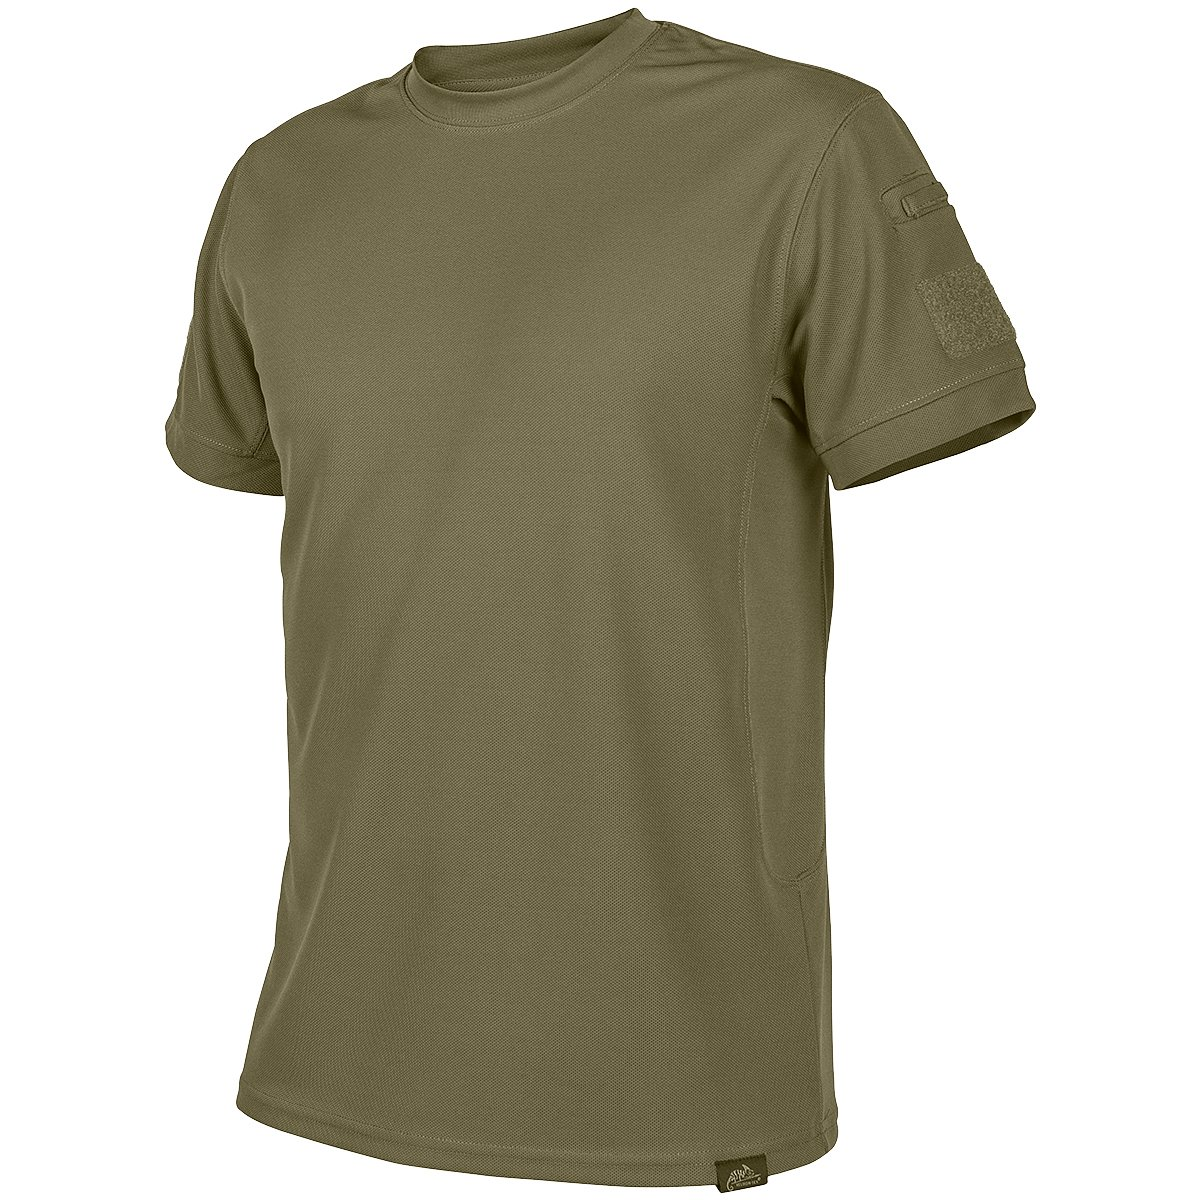 HELIKON-TEX Men's Tactical T-Shirt Adaptive Green Size L